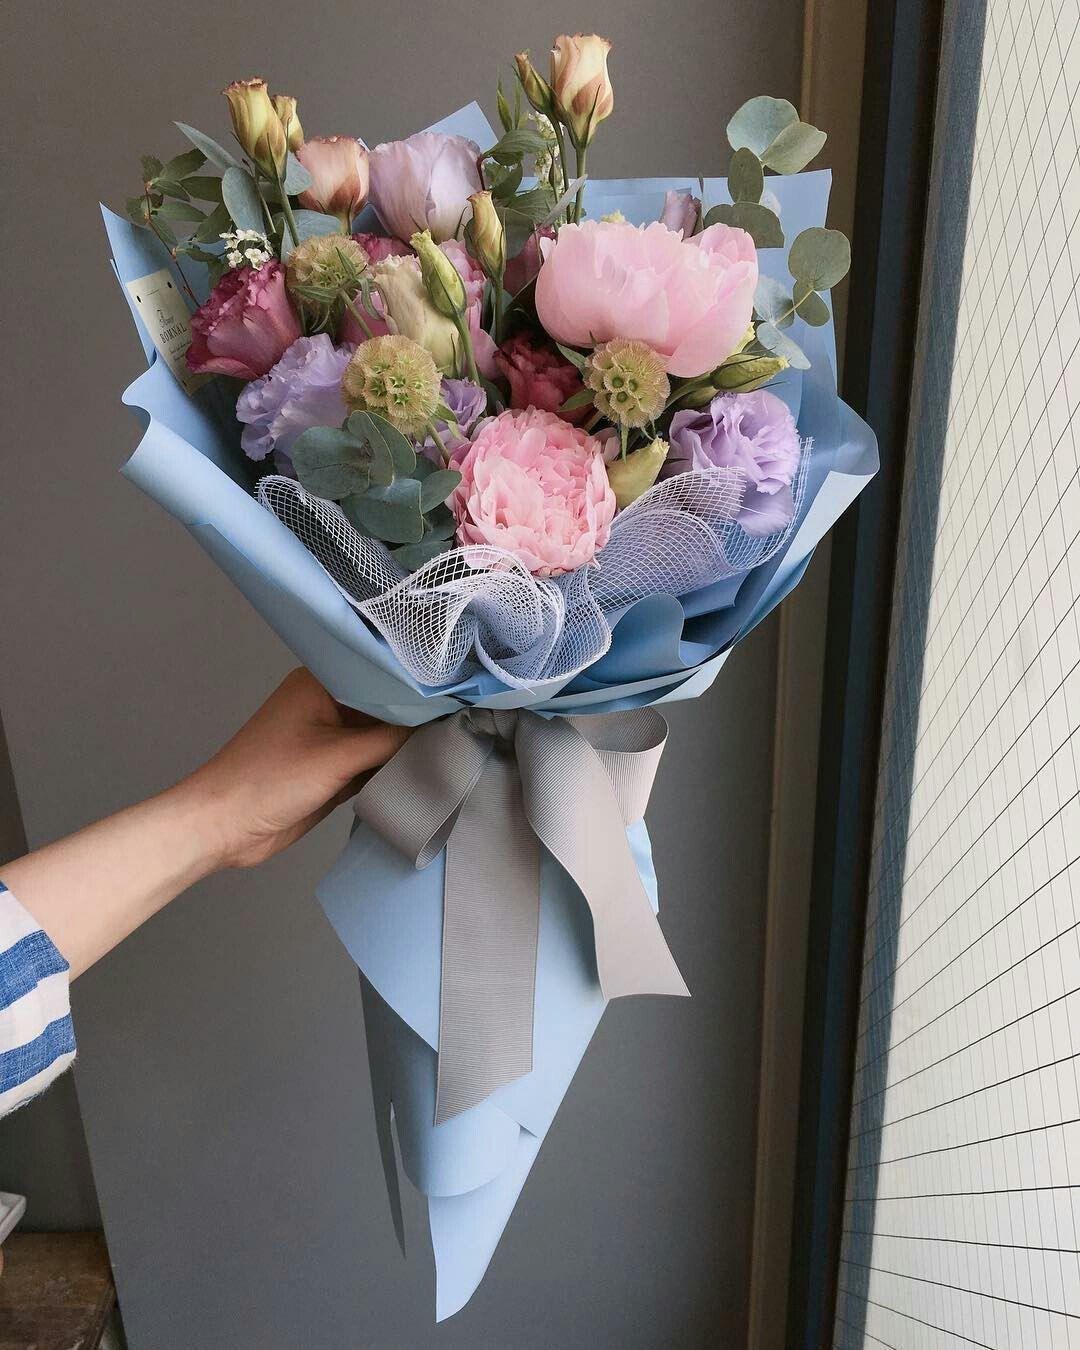 LOVE IT ♡ Flowers bouquet gift, Flower bouquet diy